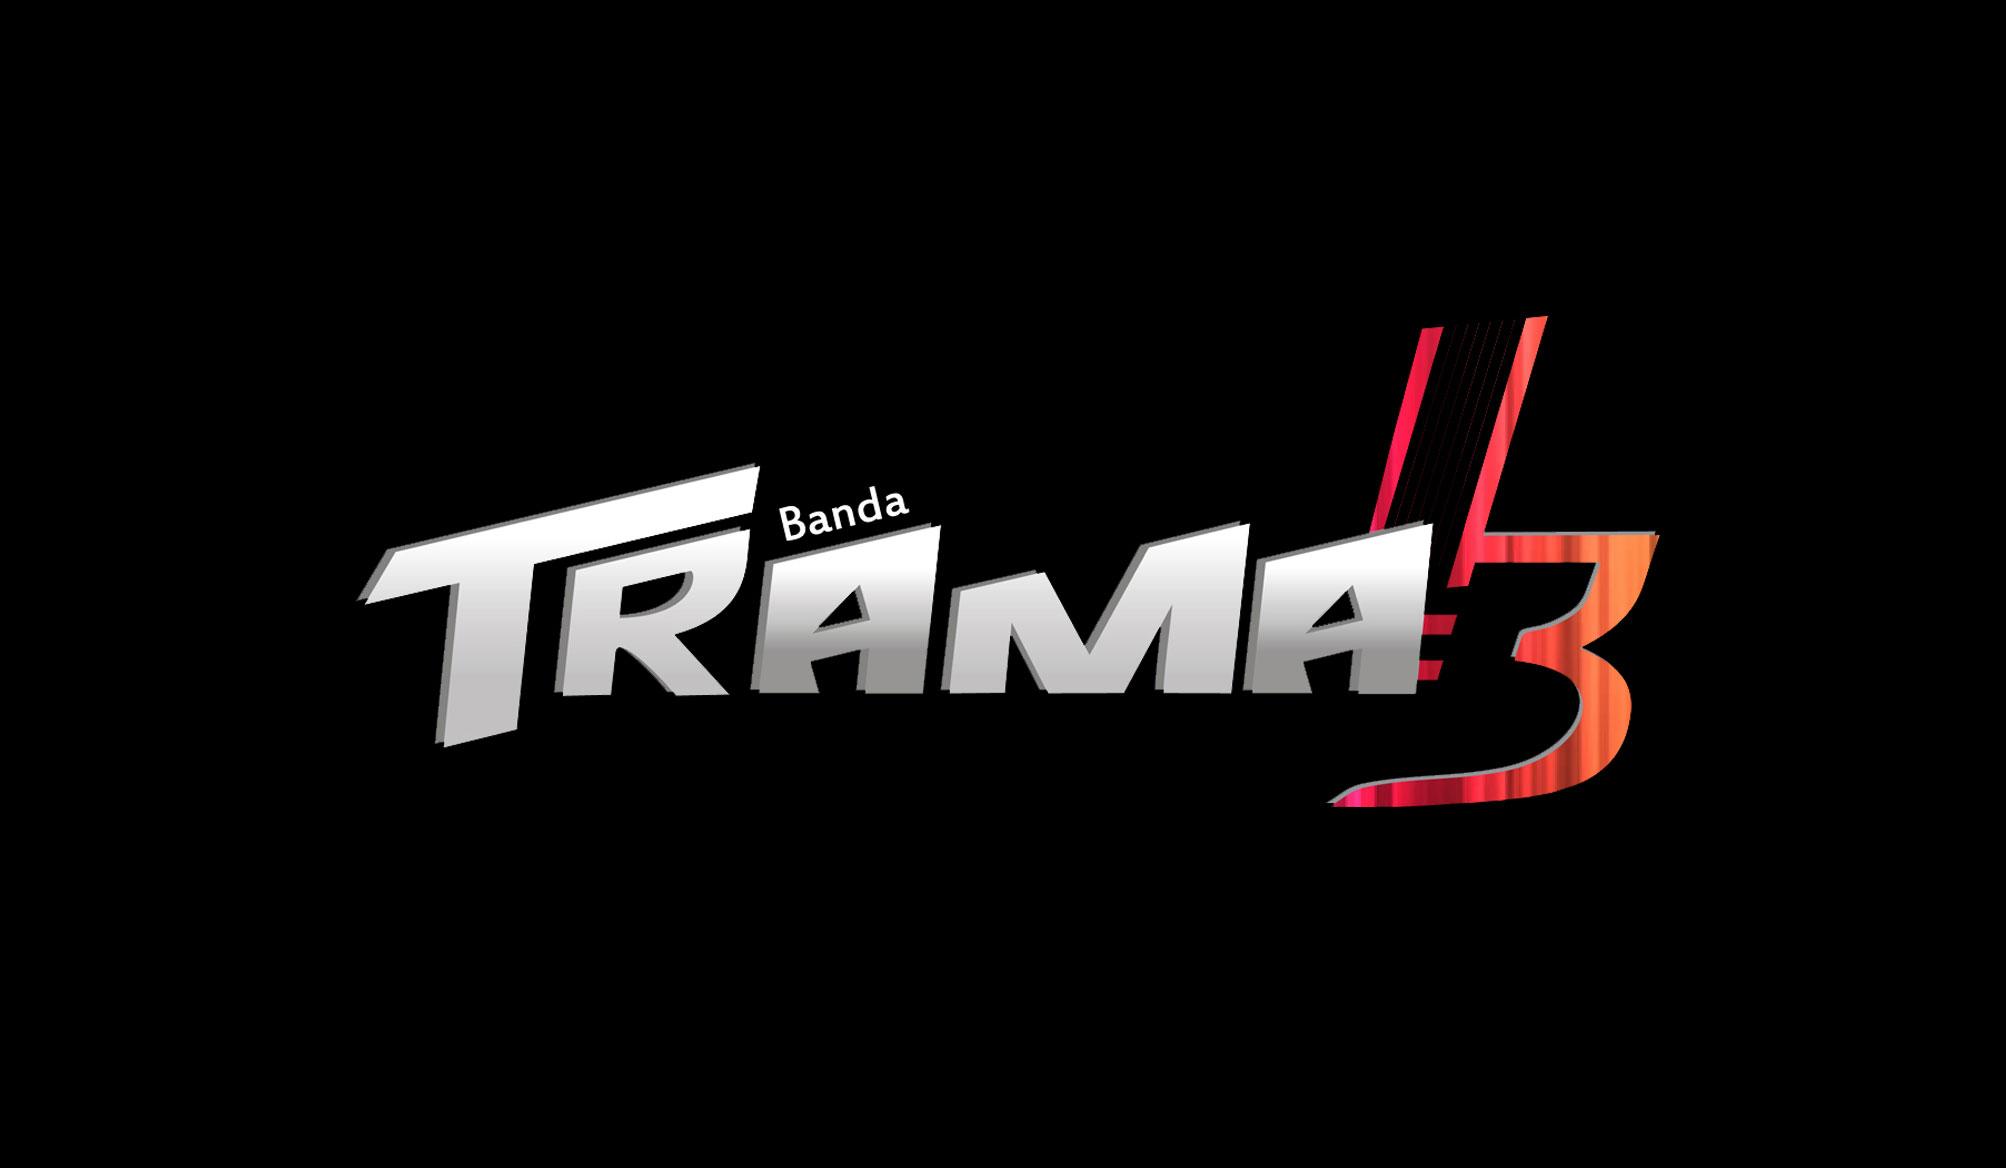 Banda Trama 3